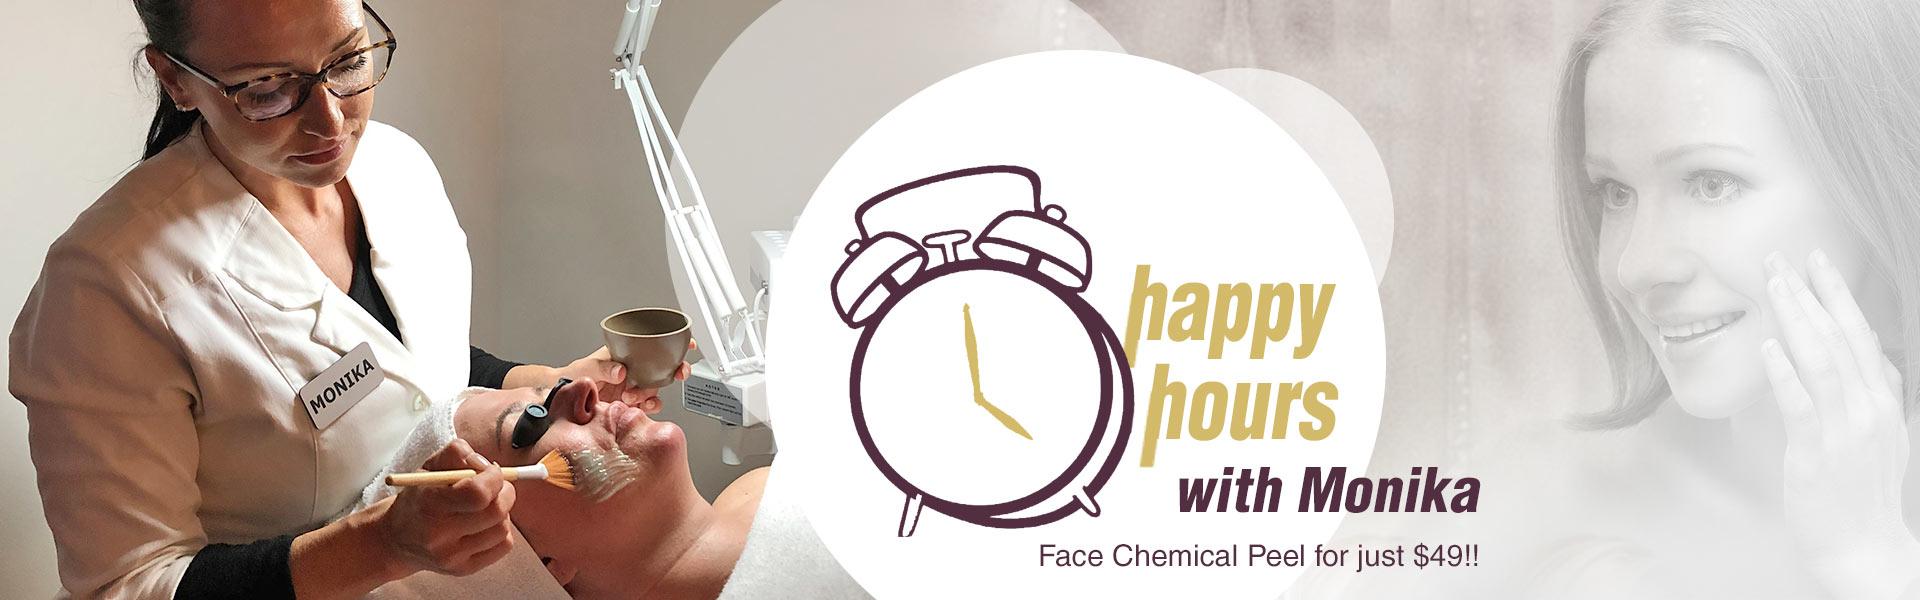 mspa_happy-hours-slider_09-01-2019